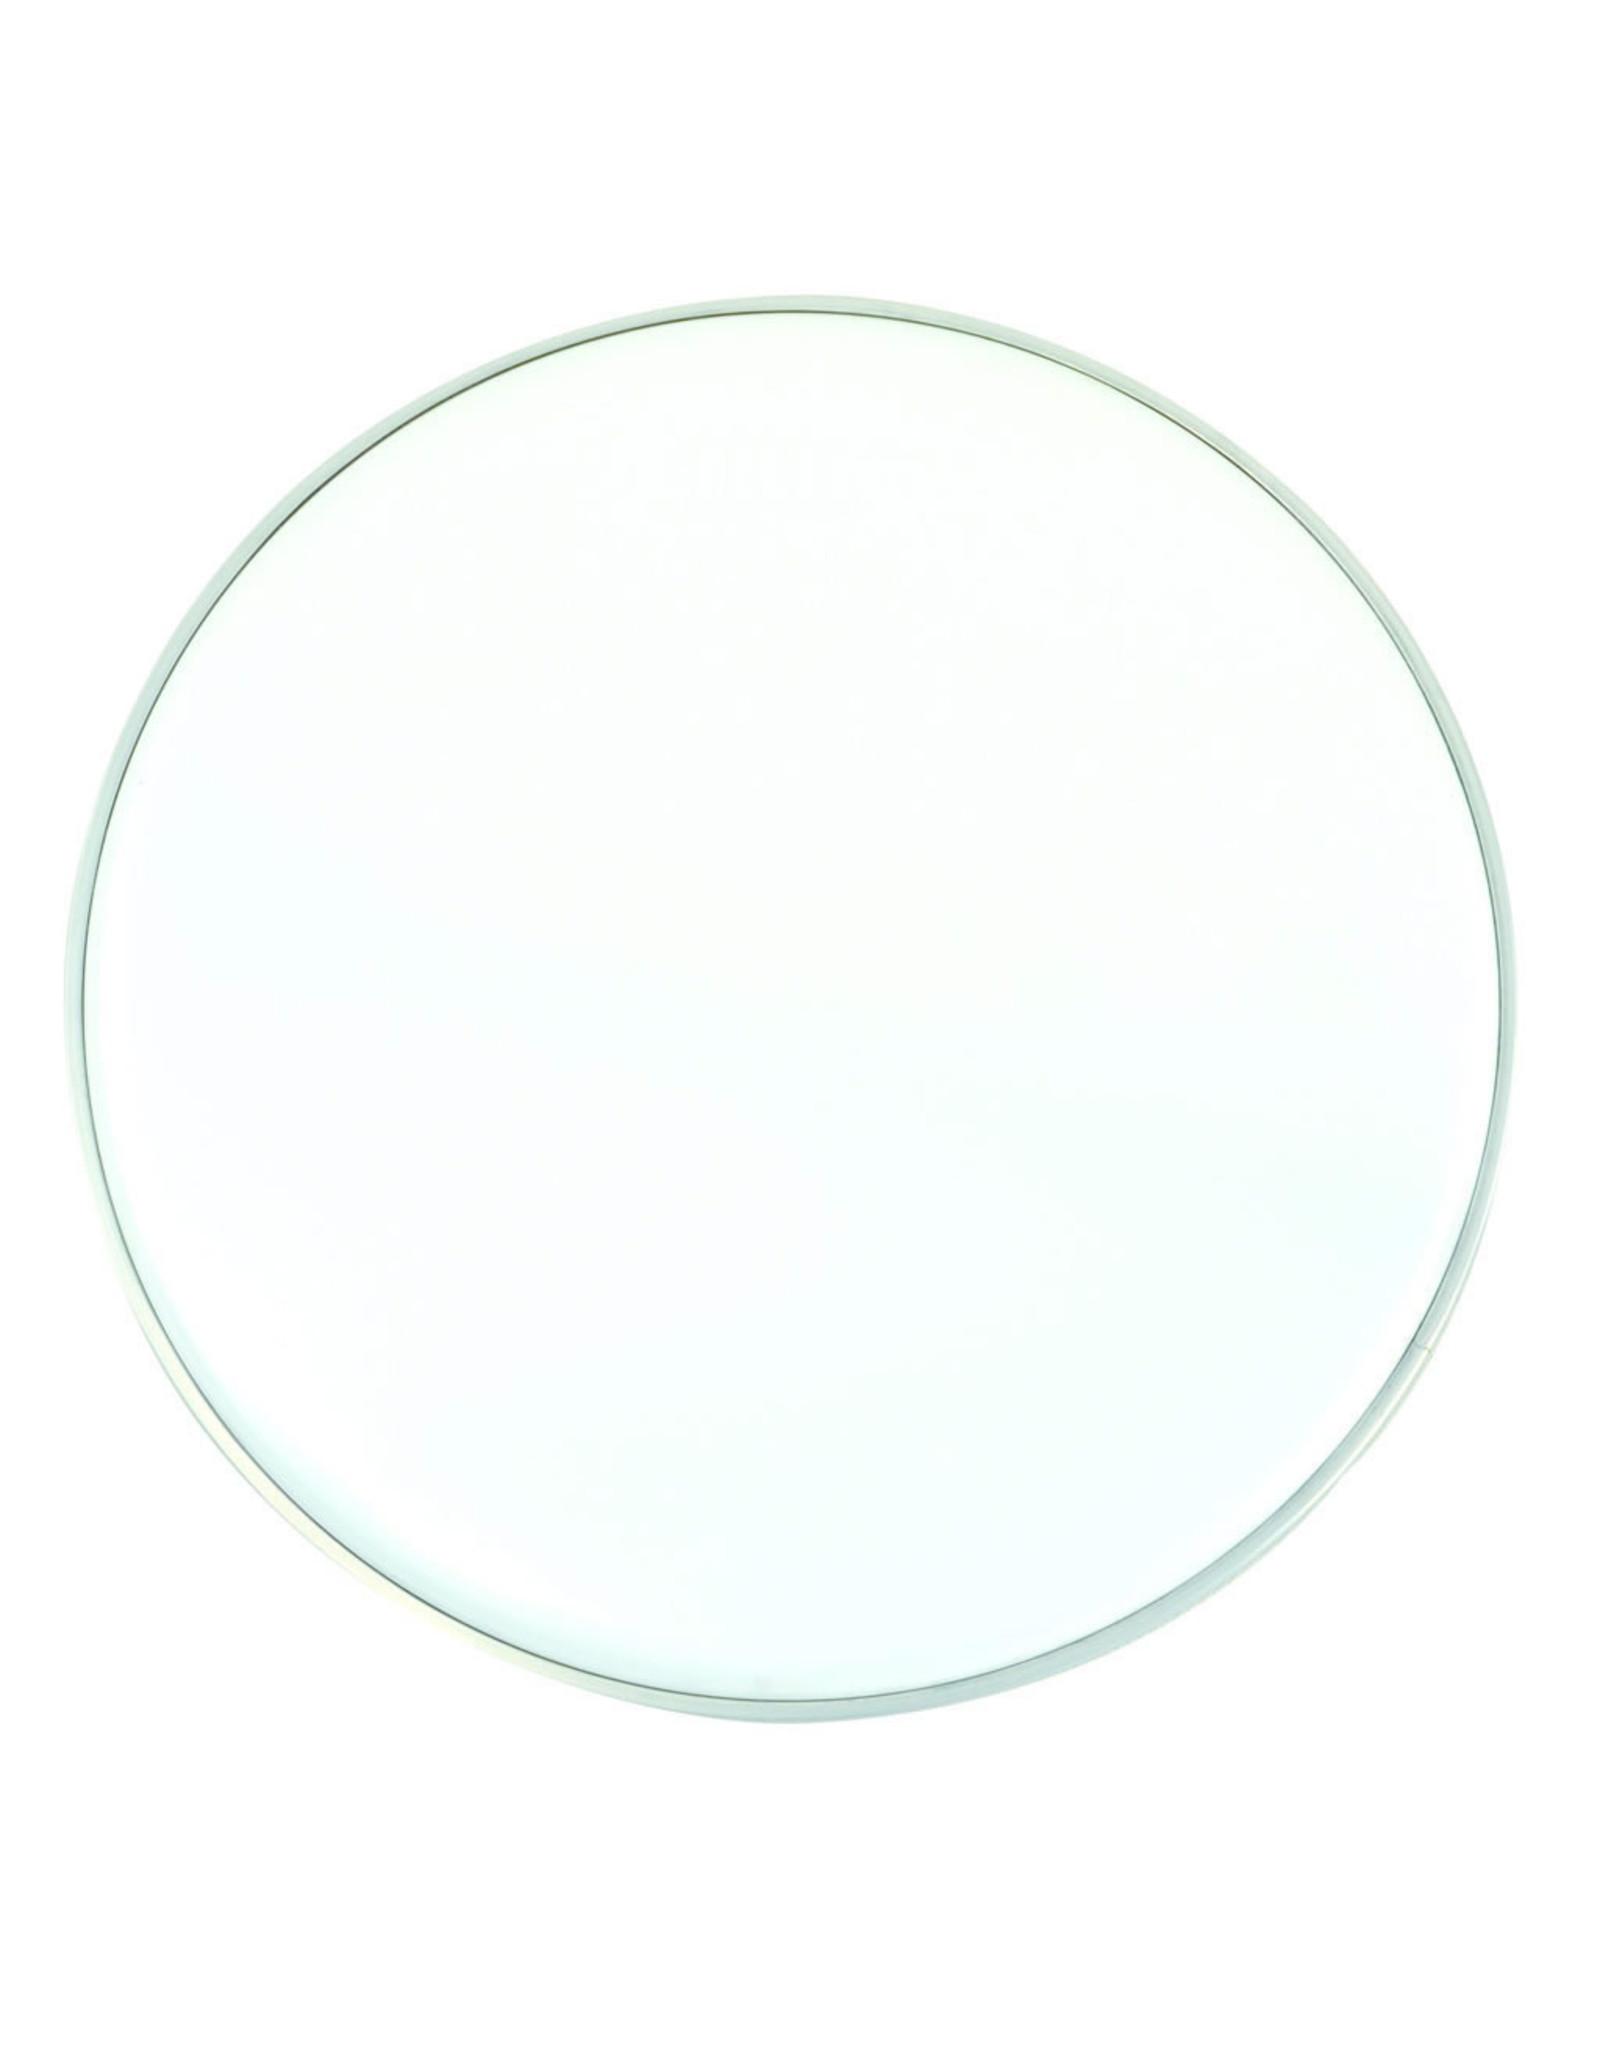 Ramm® Bassdrumvel 22 Inch | Transparant | Slagvel